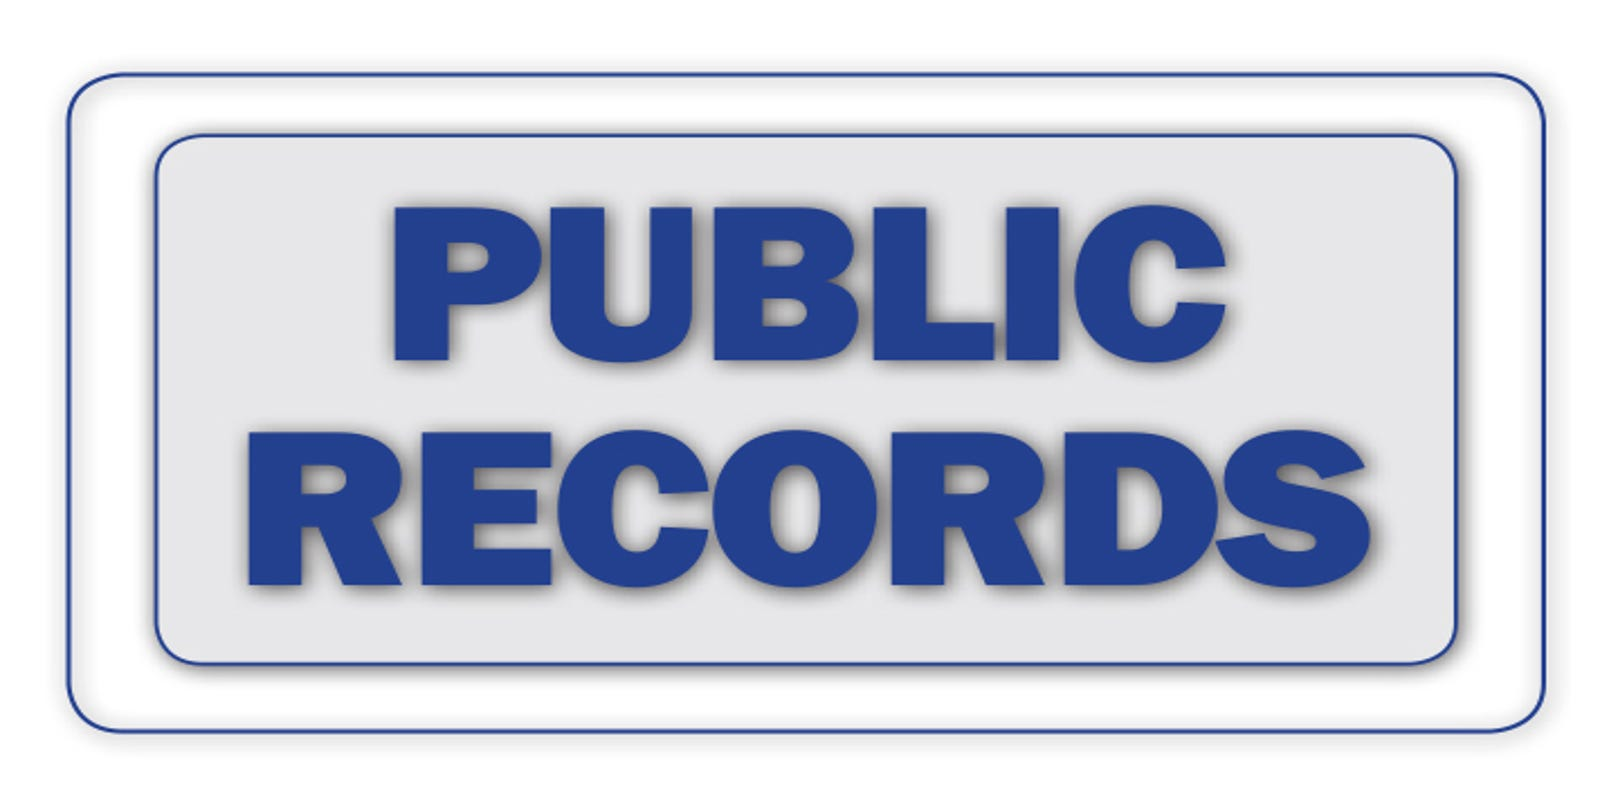 Public records: June 2017